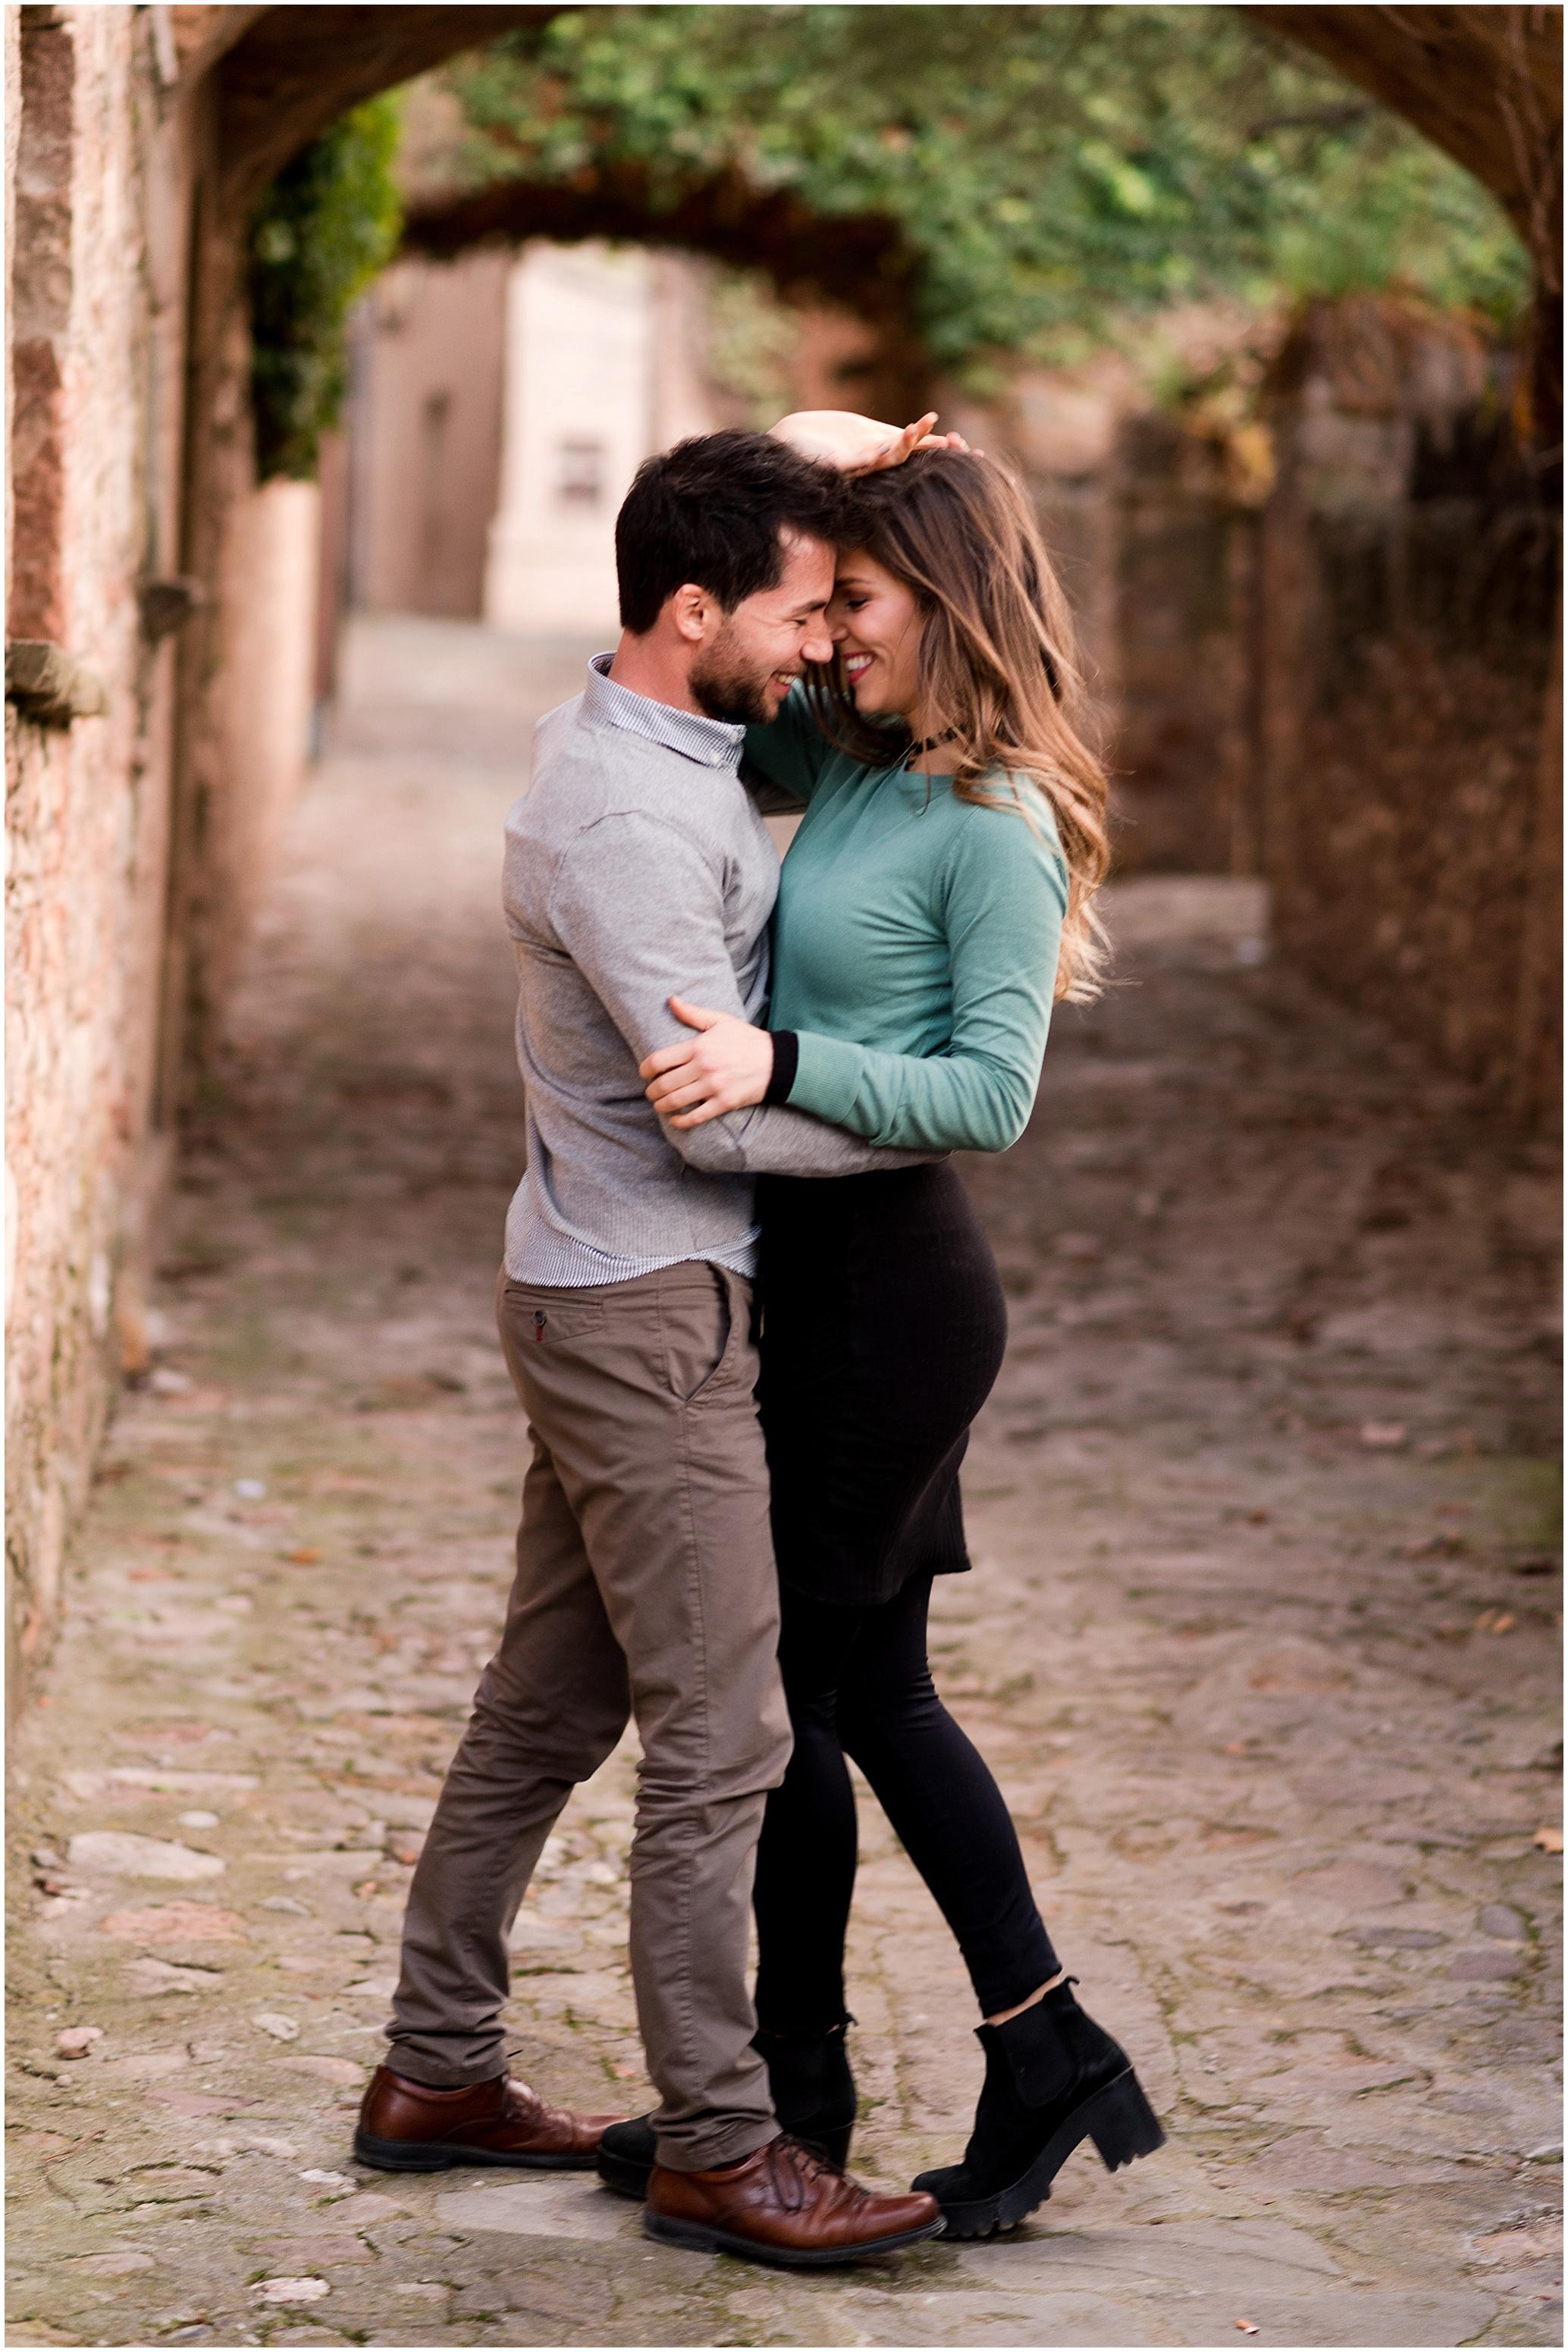 Hannah Leigh Photography Barcelona Spain Engagement Session_3282.jpg